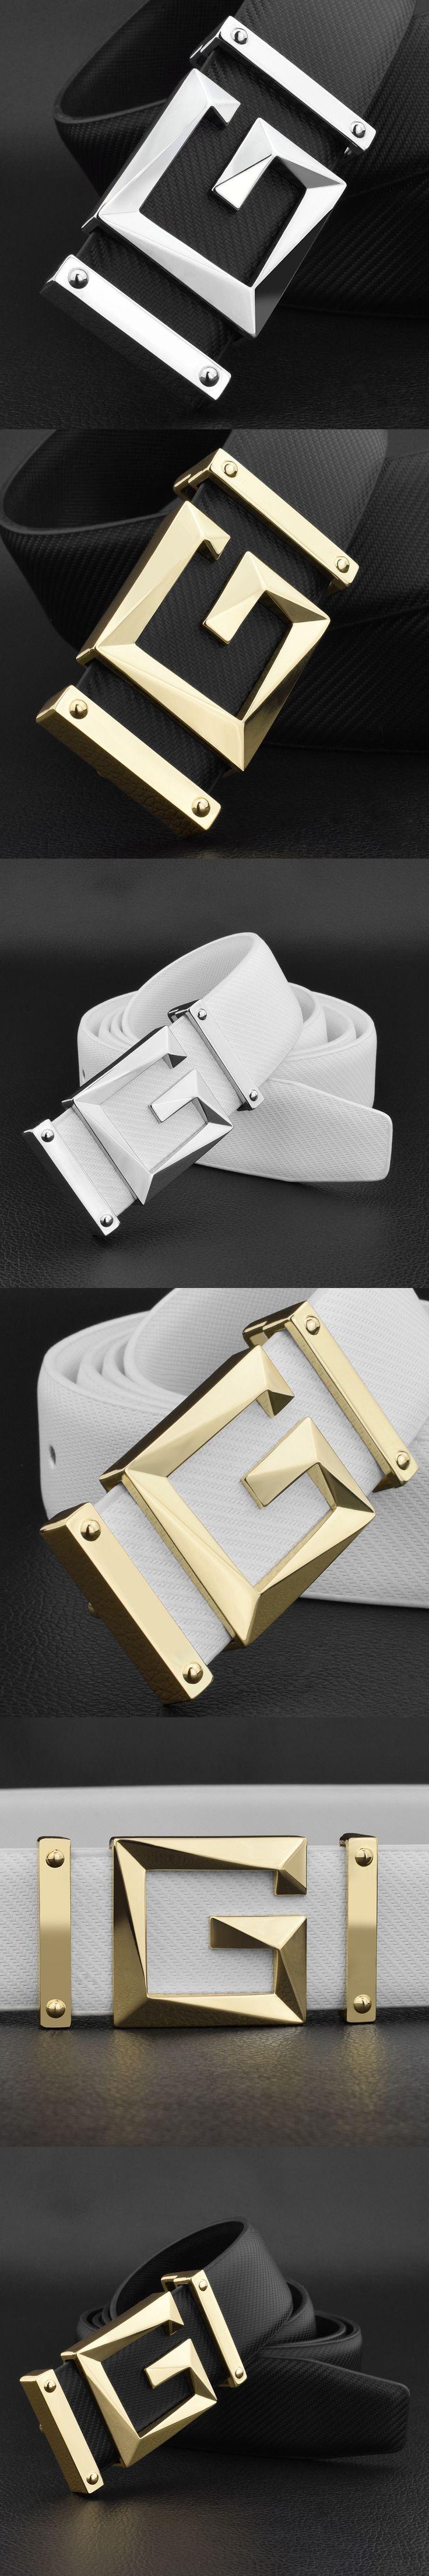 Fashion Letter g belt men genuine leather High Quality belt designer luxury brand corset belt famous Cowhide gold waist belt